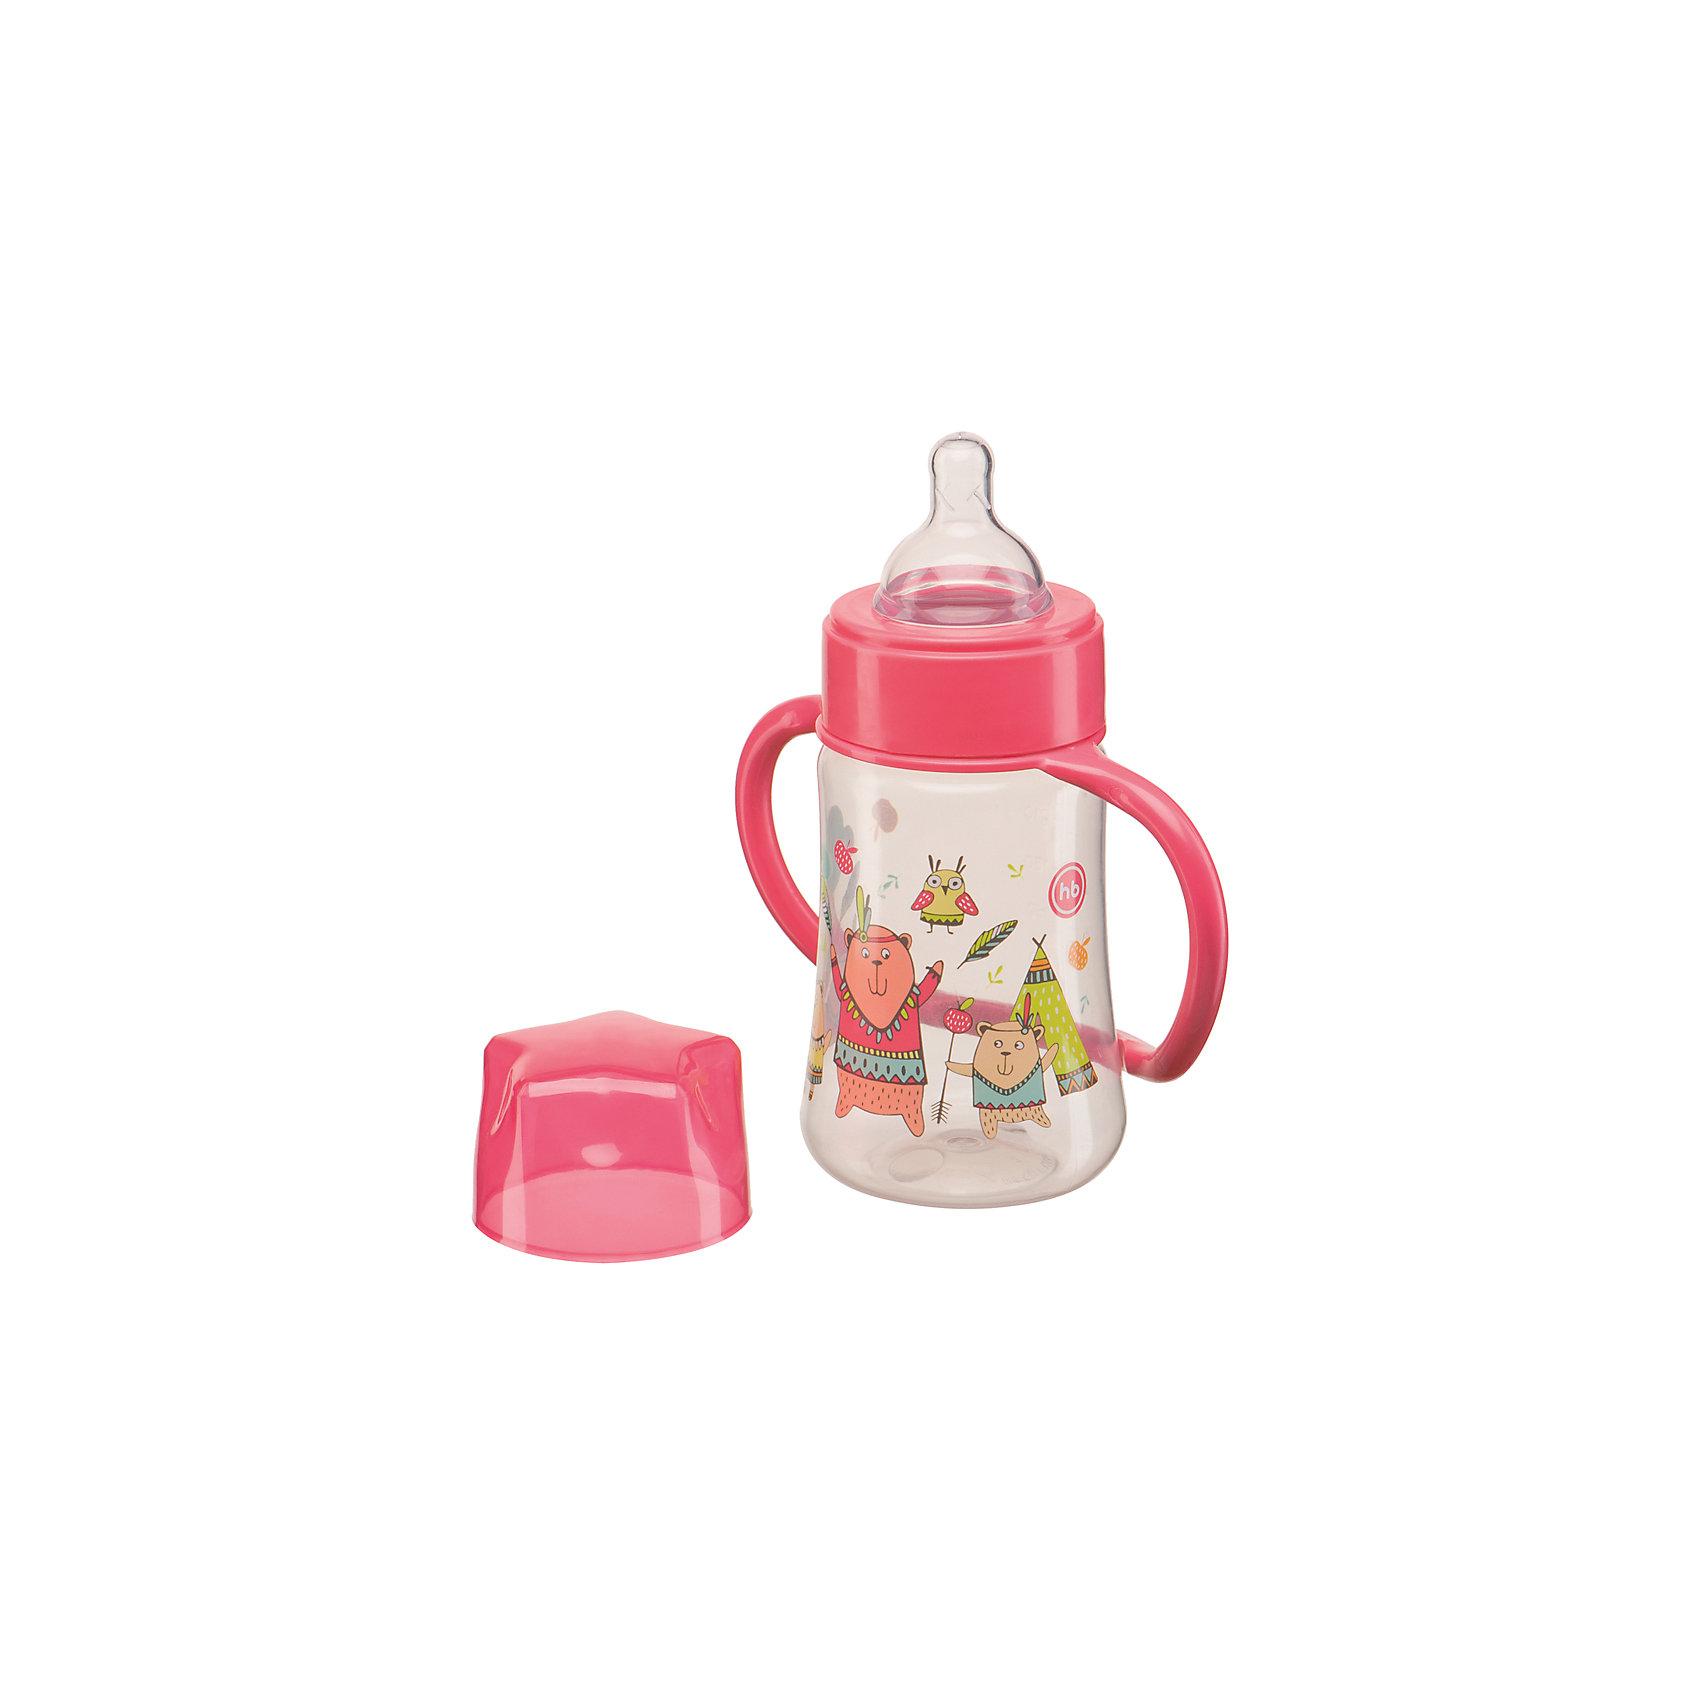 Happy Baby Бутылочка для кормления с ручками, 250 мл, Happy Baby, красный бутылочка для кормления happy baby с ручками и силиконовой соской baby bottle lilac 10008 широкое горлышко 250 мл